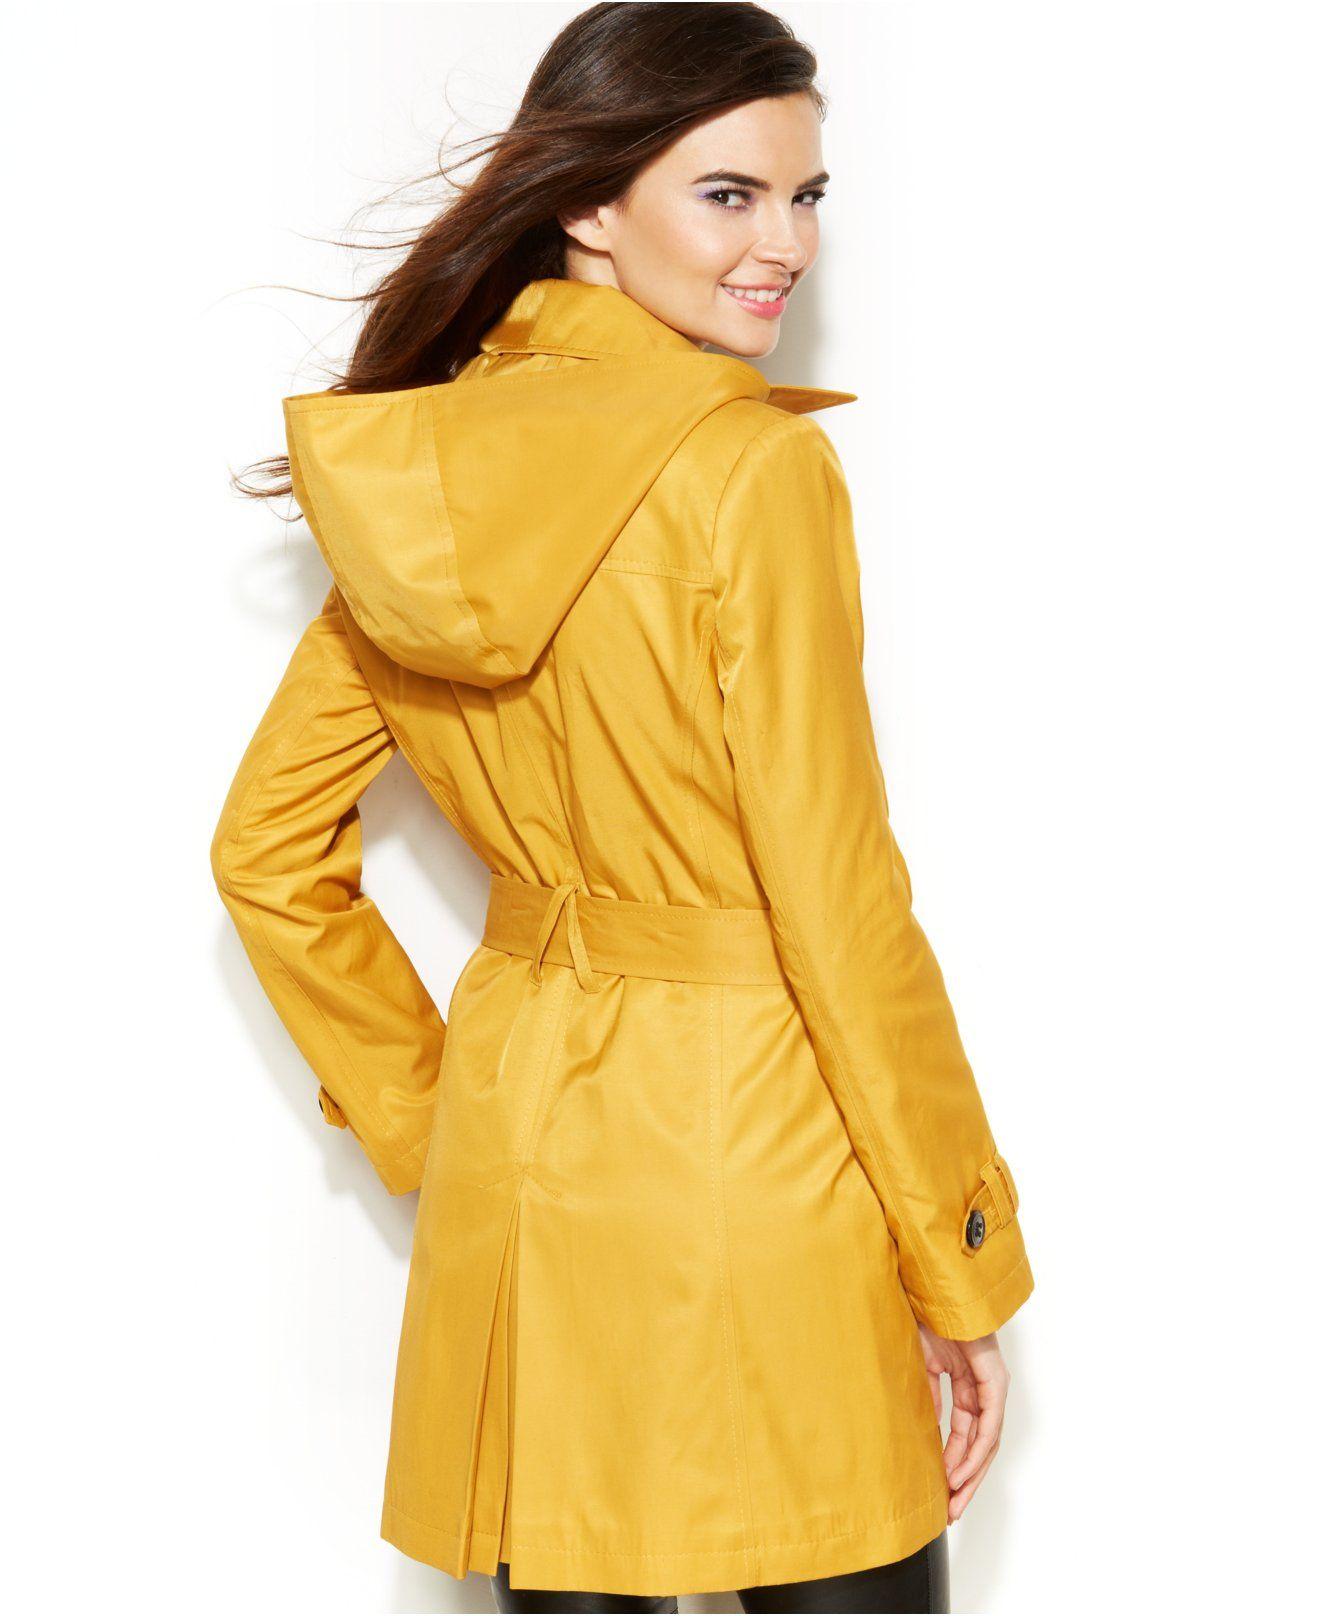 Dkny Hooded Trench Raincoat Coats Women Macy S Raincoat Coats For Women Coat [ 1616 x 1320 Pixel ]